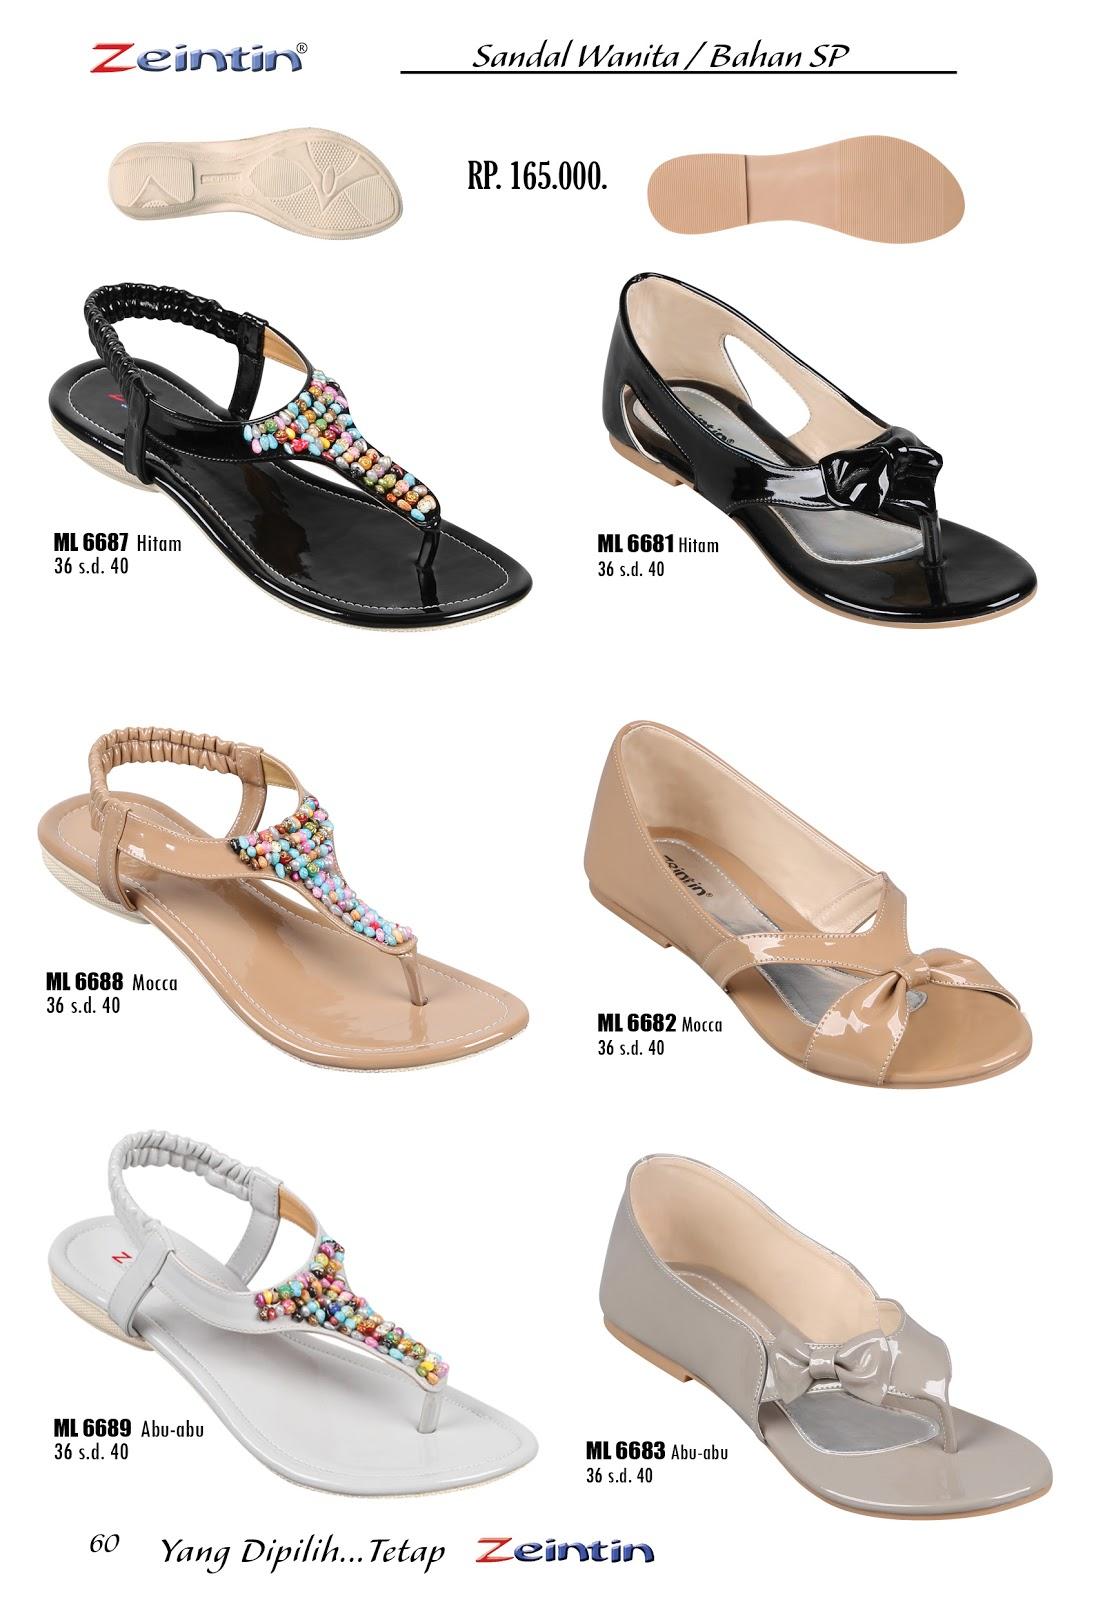 Jual sepatu cantik murah online cibaduyut-All Products ...